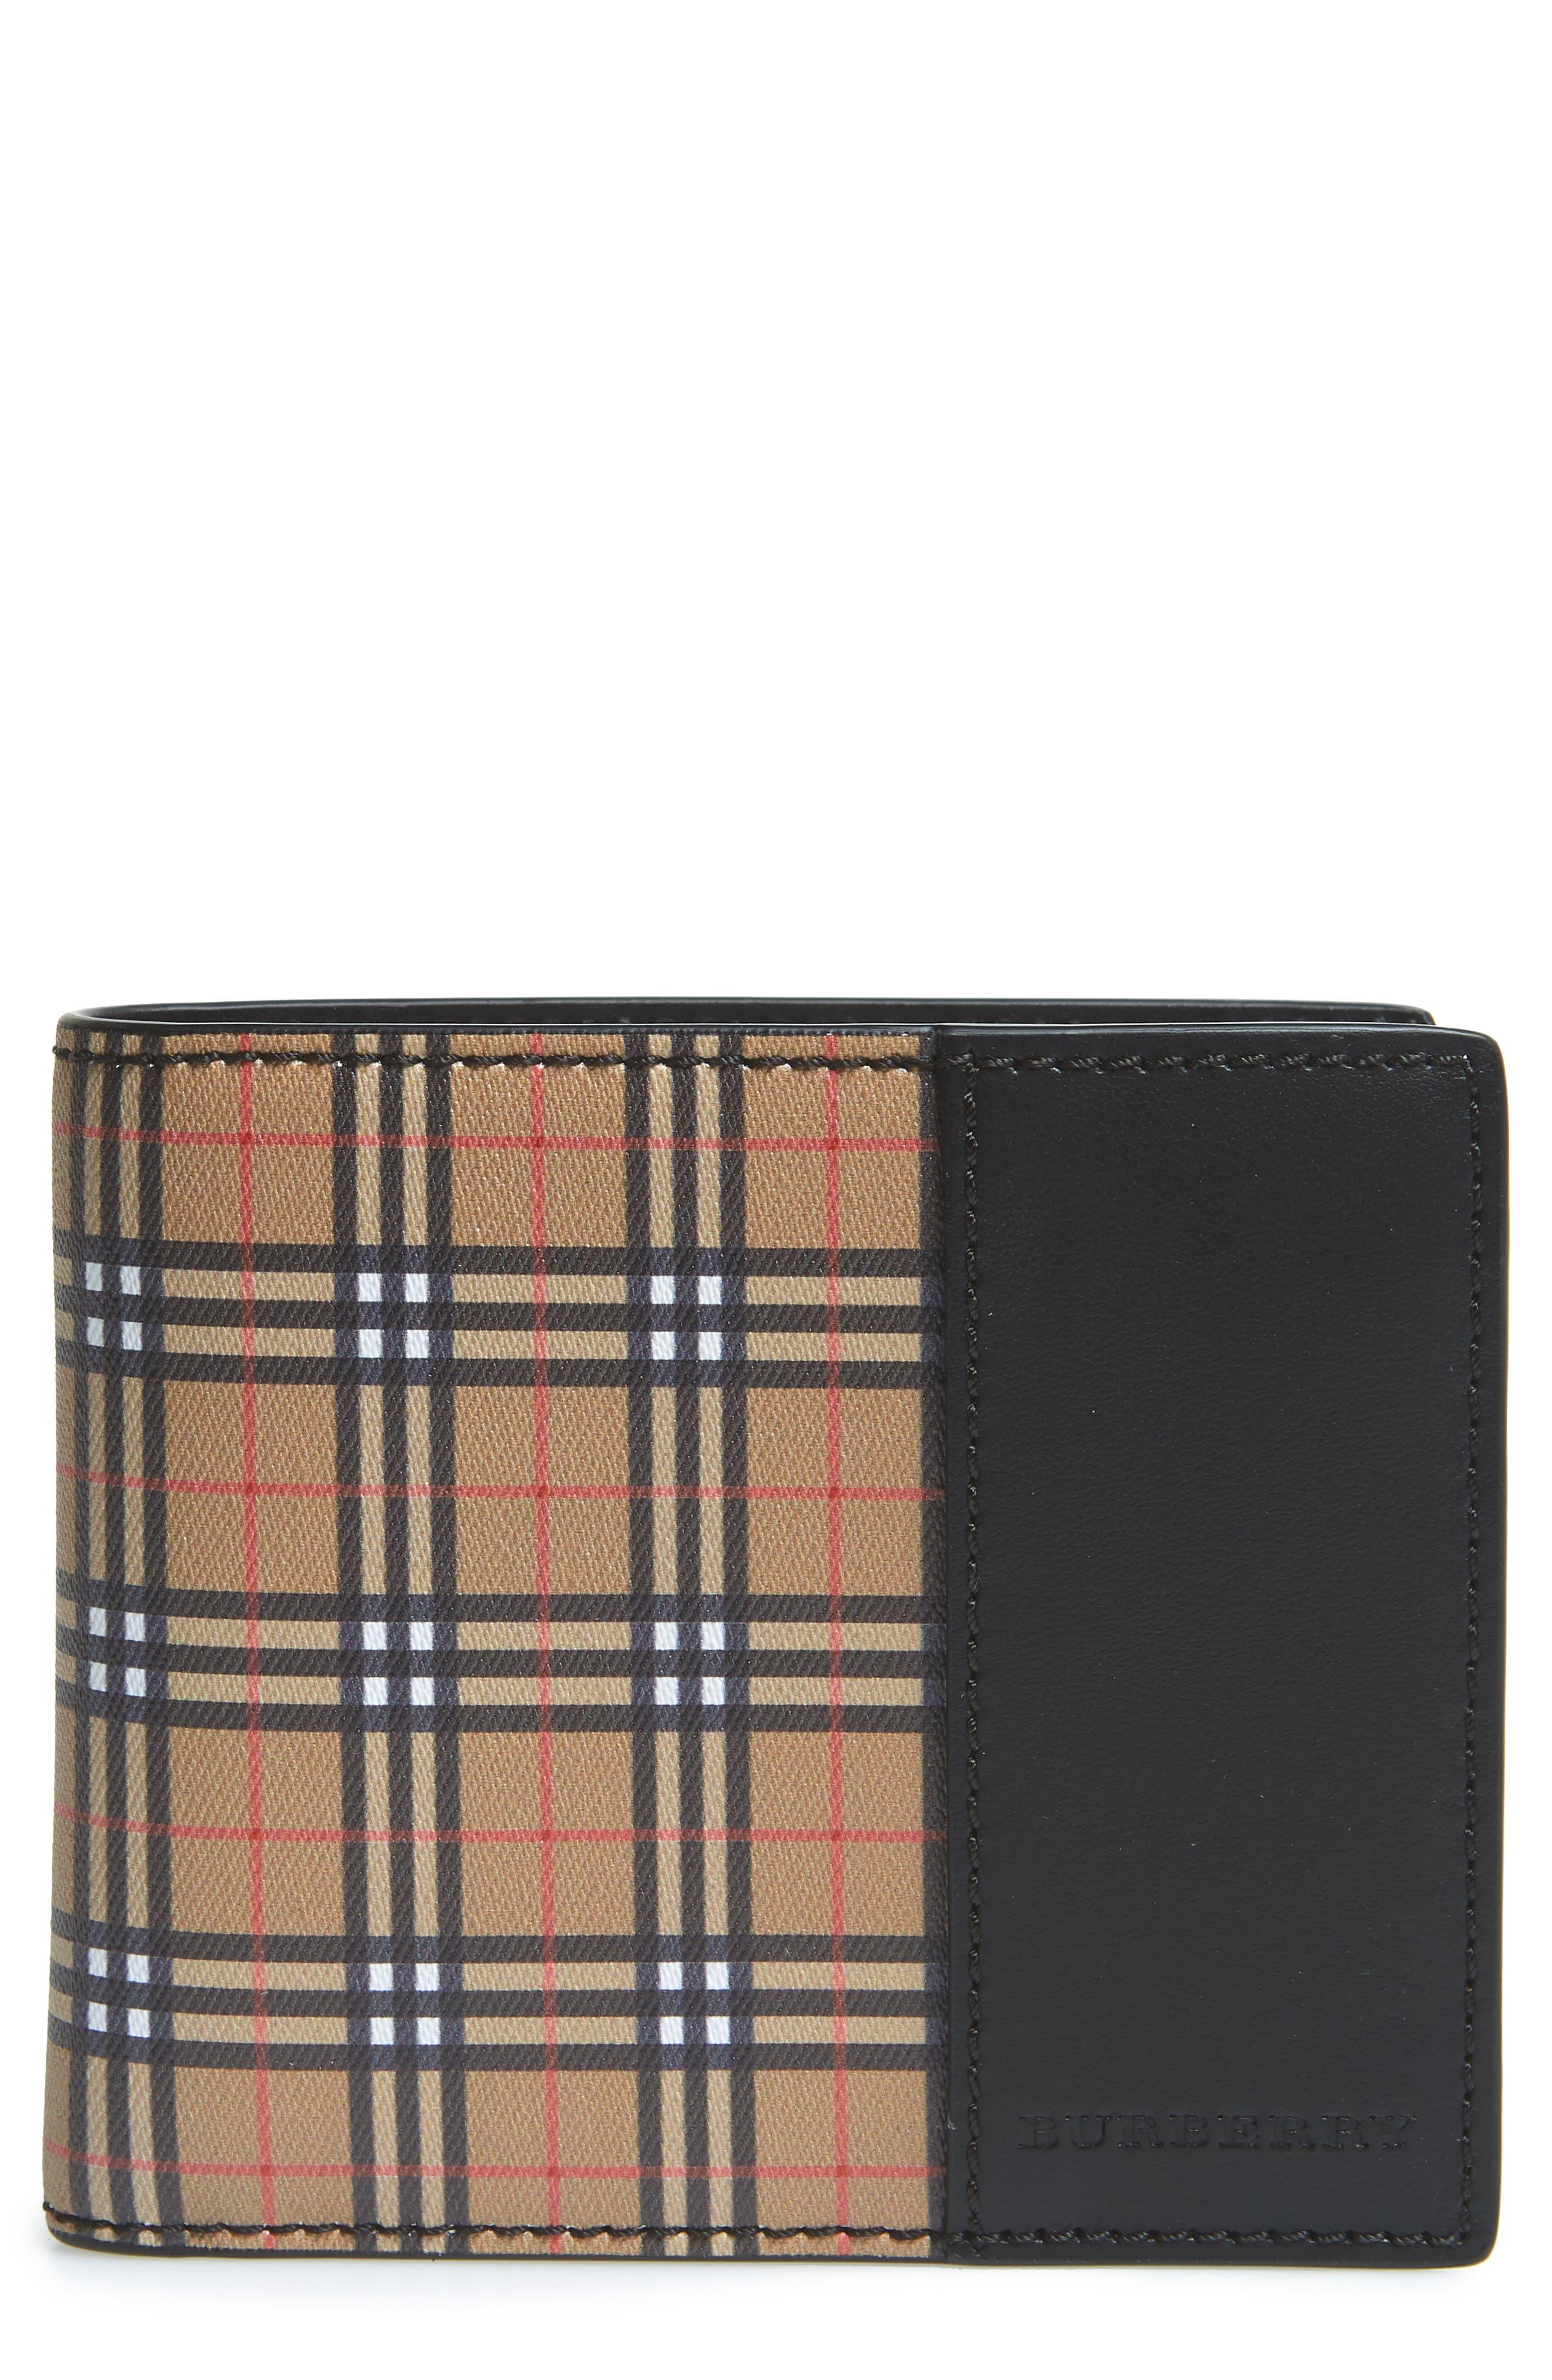 BURBERRY,                             Wallet,                             Main thumbnail 1, color,                             ANTIQUE YELLOW/ BLACK